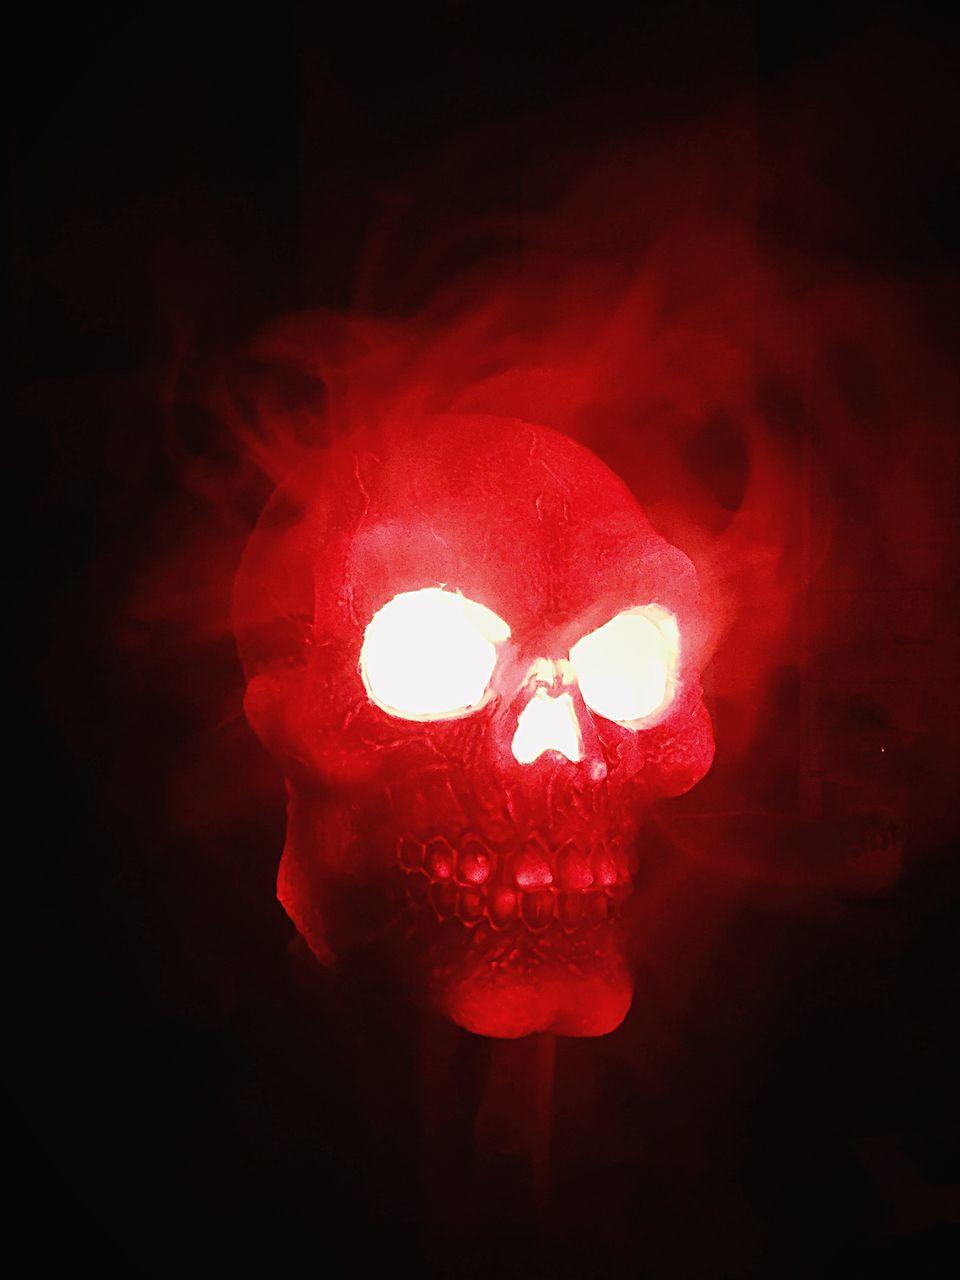 Close-Up Of Illuminated Red Skull